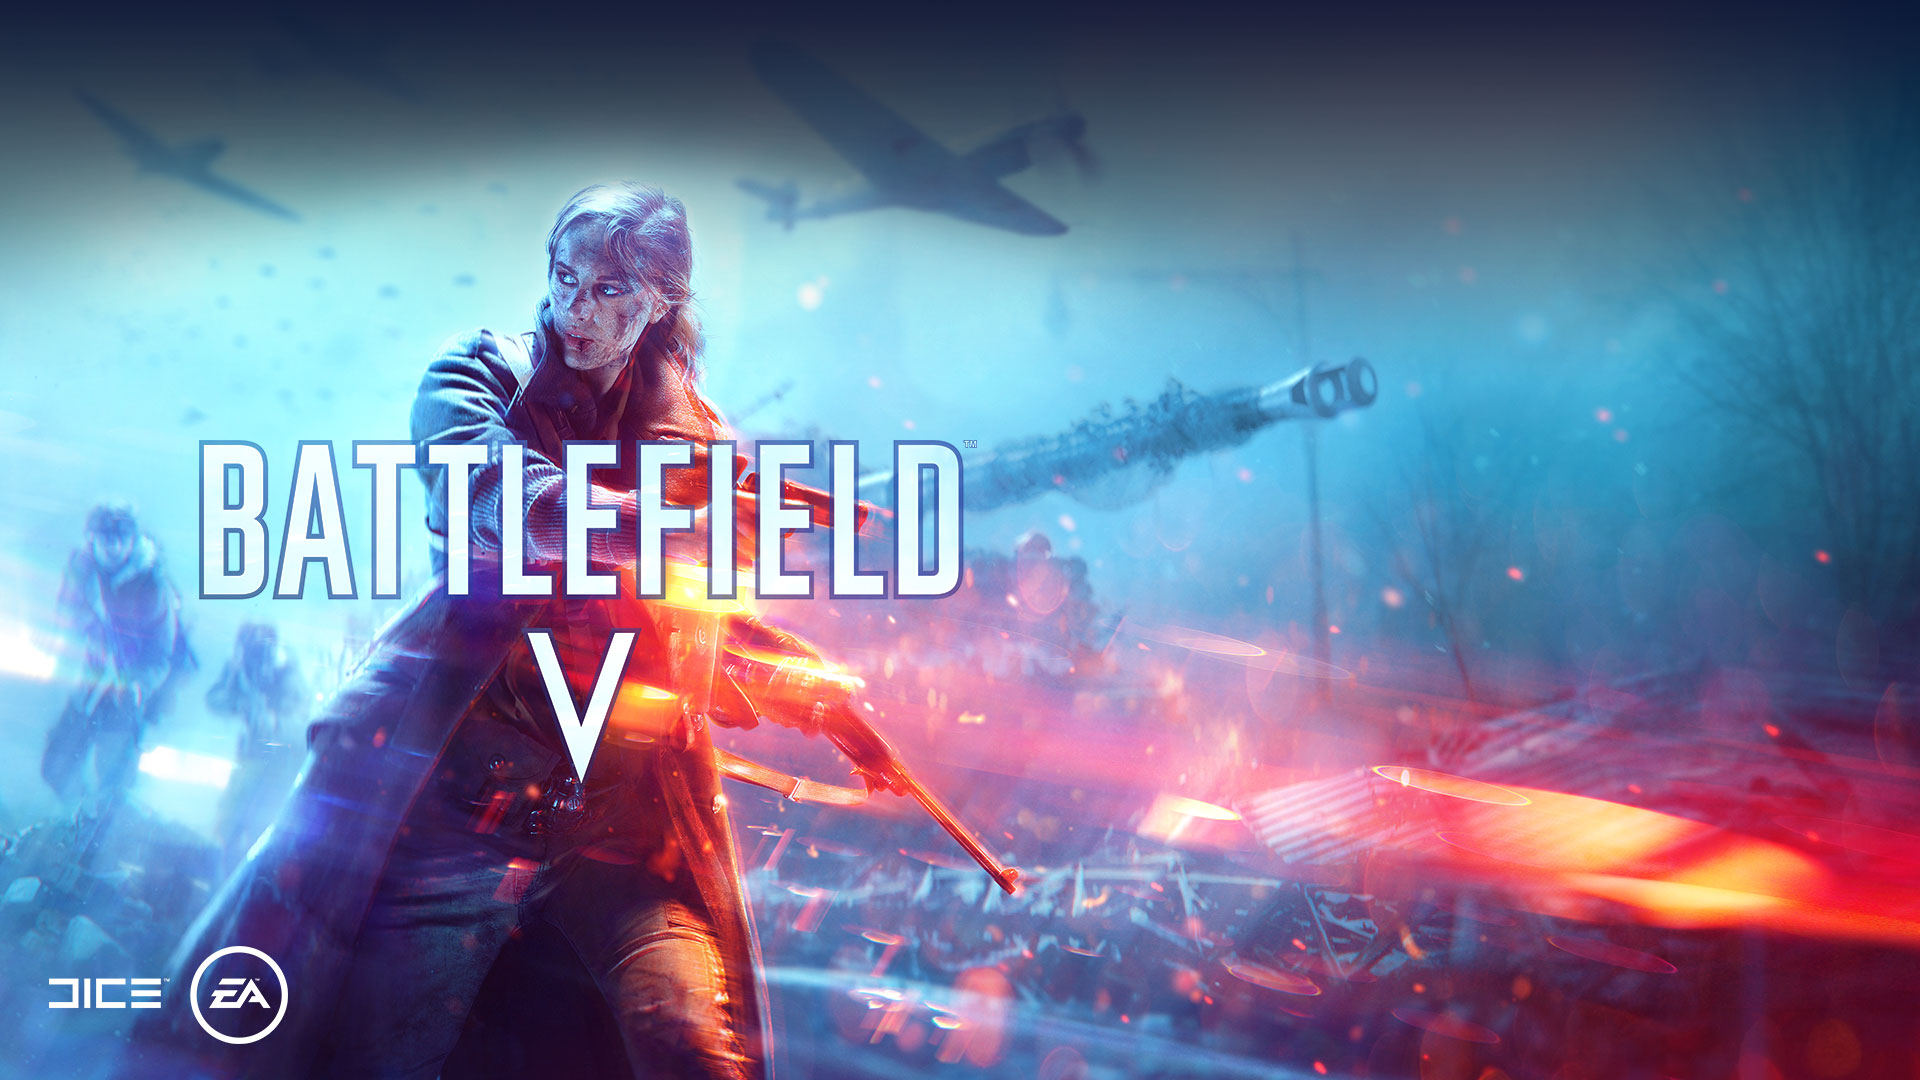 Battlefield V, Dice EA, Vista frontal de un soldado francés.